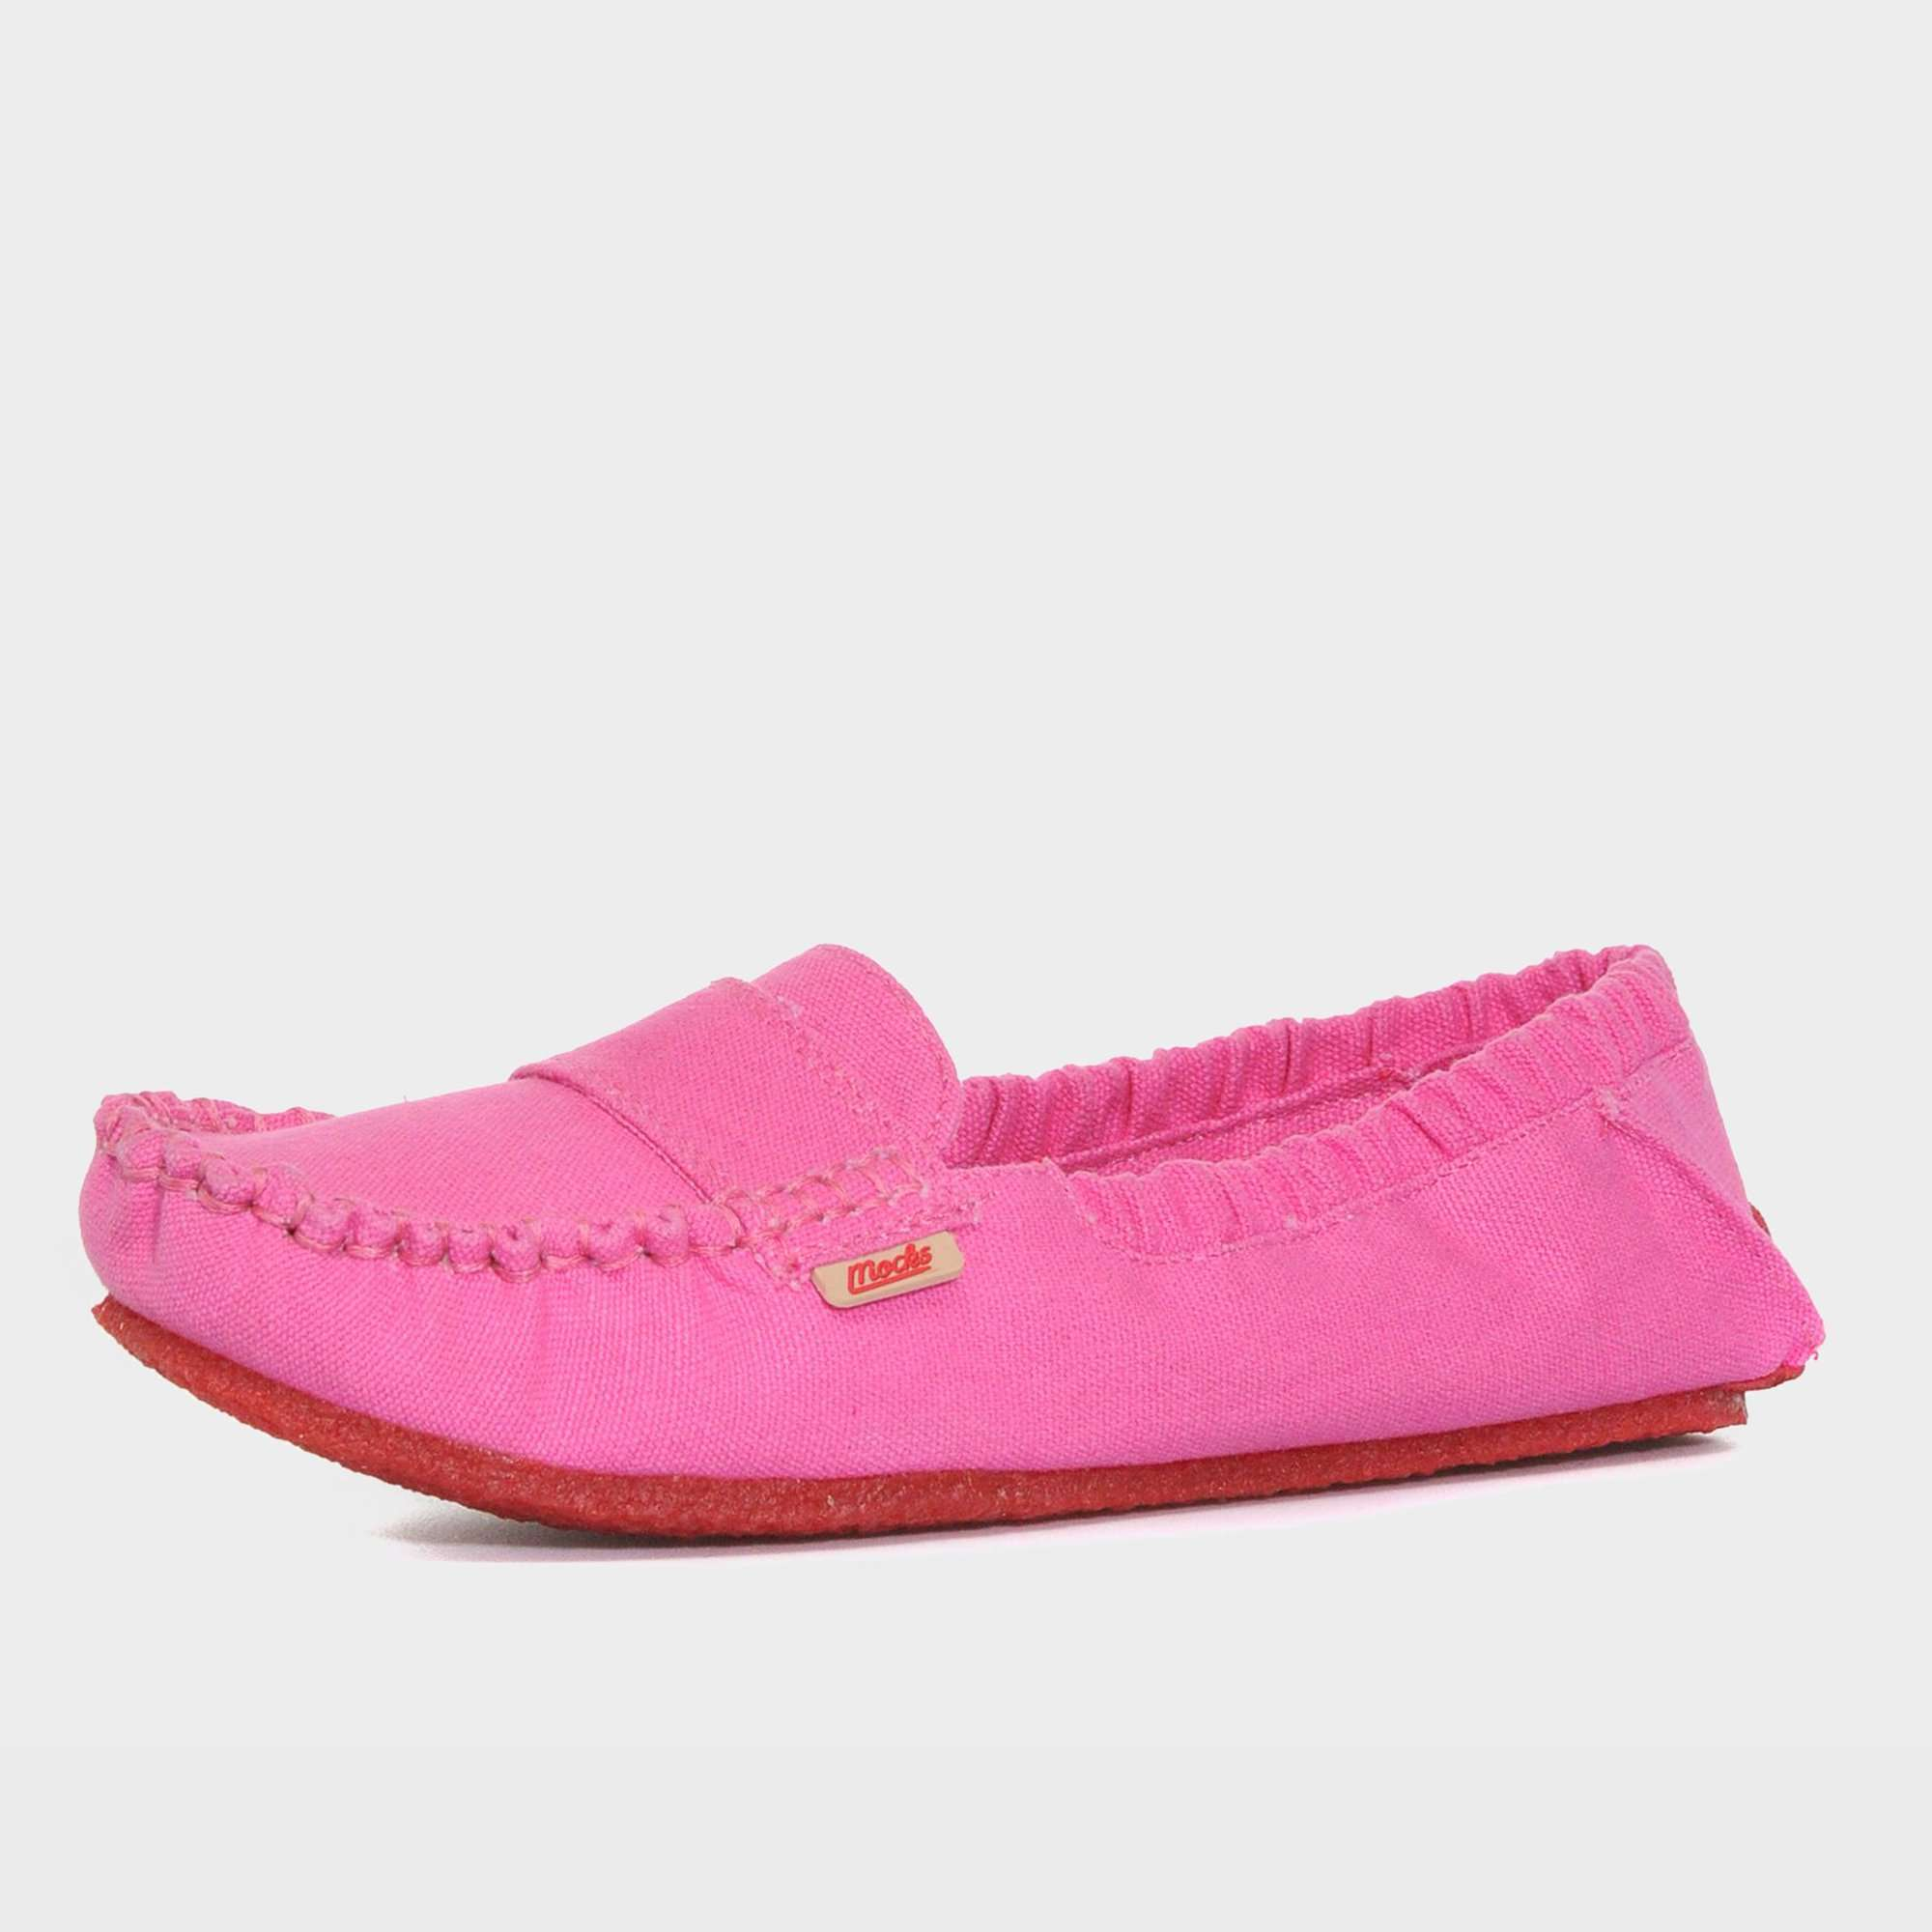 MOCKS Women's Classic Canvas Shoe